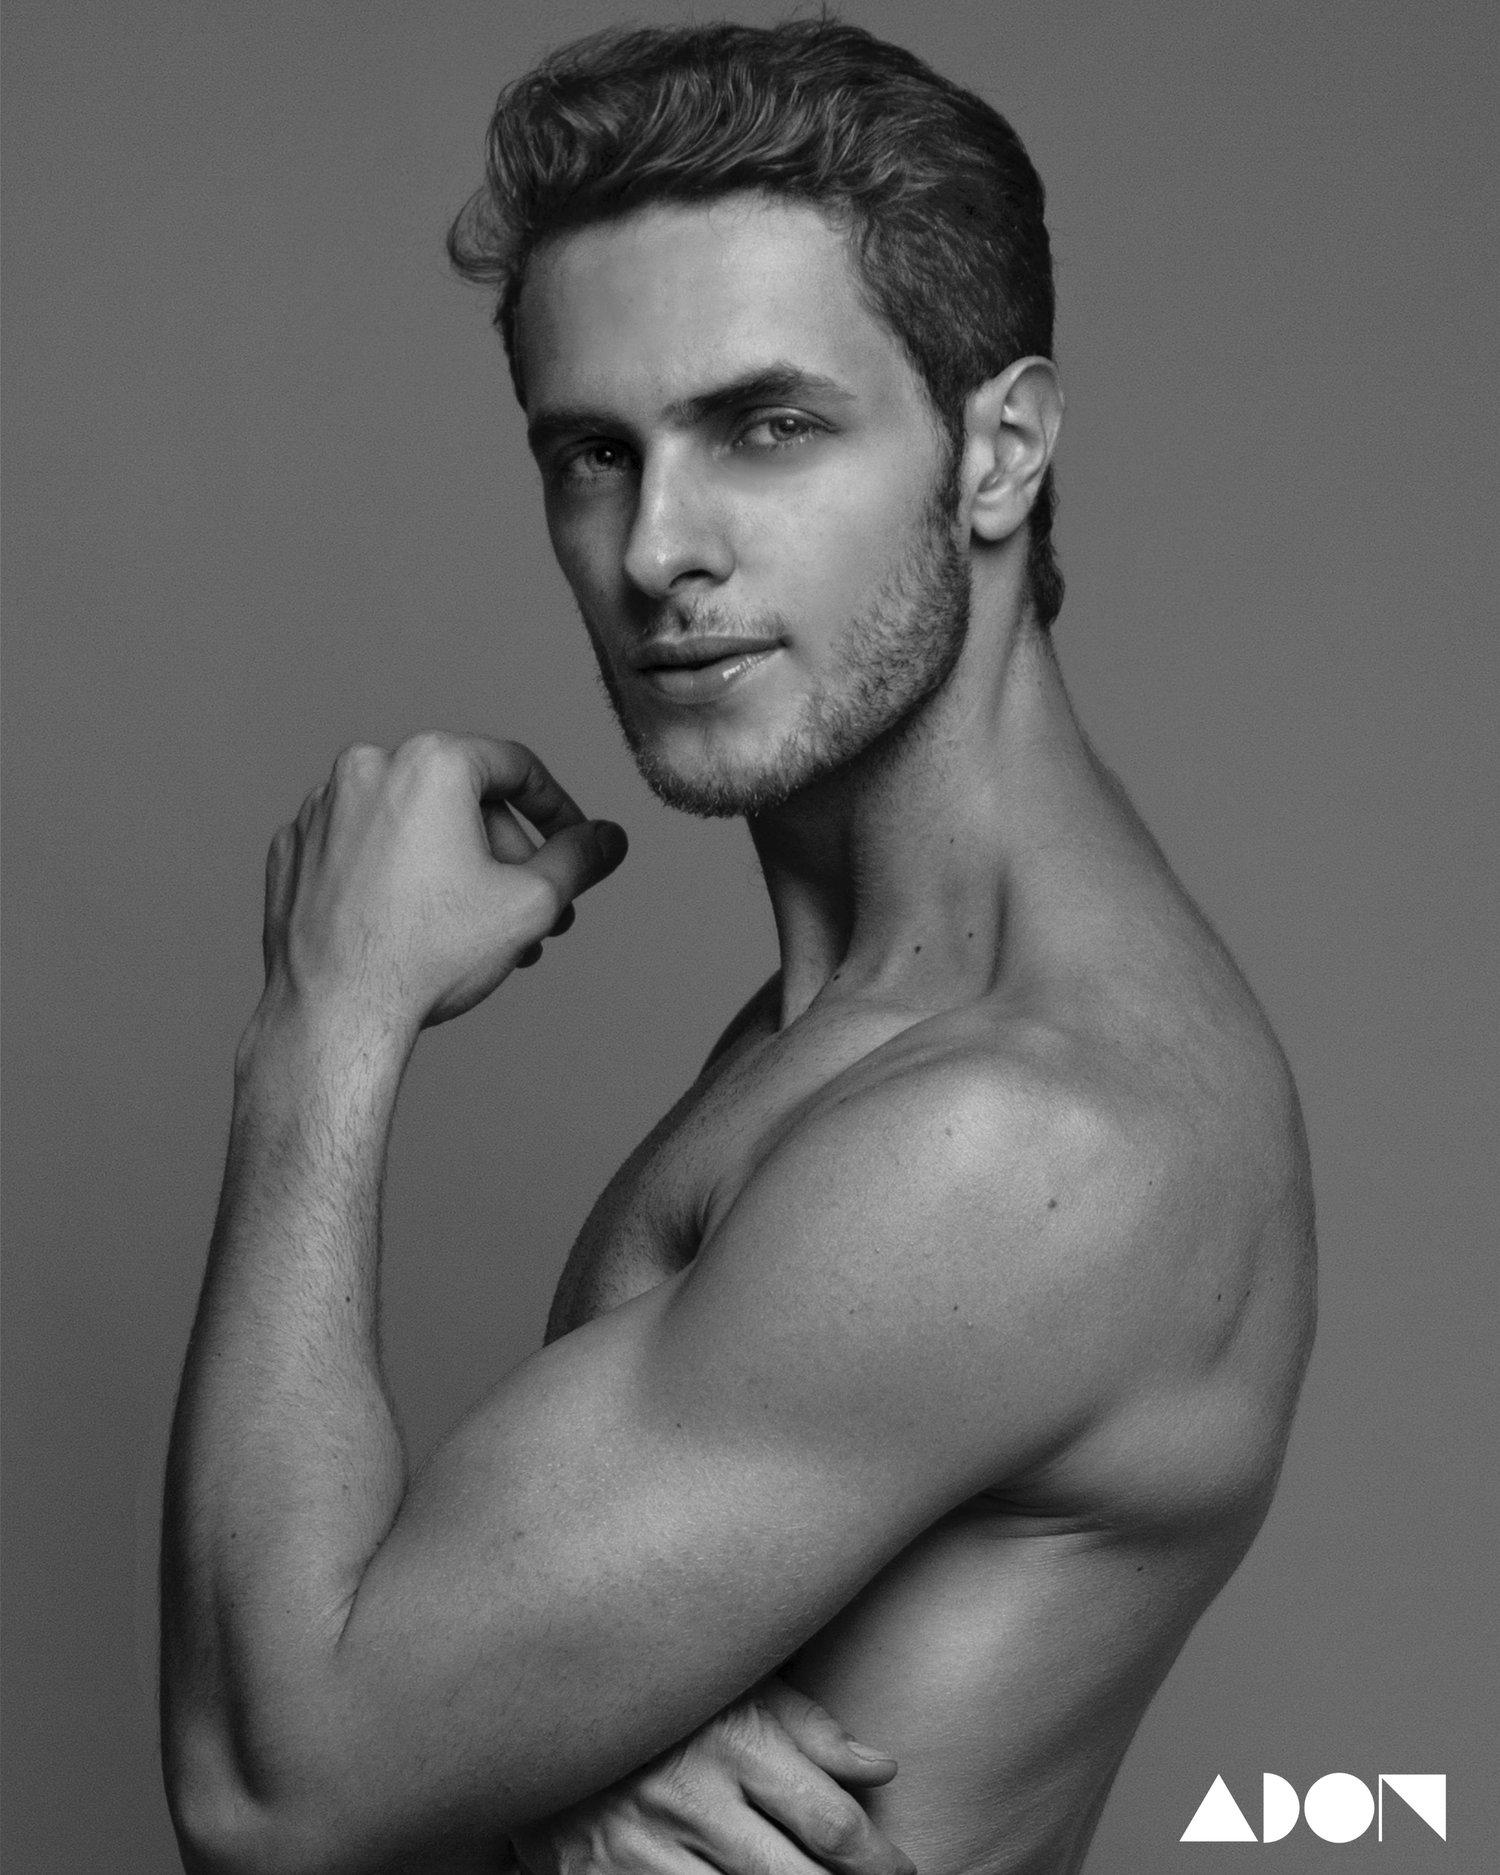 Adon Exclusive: Model Gabriel Ramos By Sandy Lang